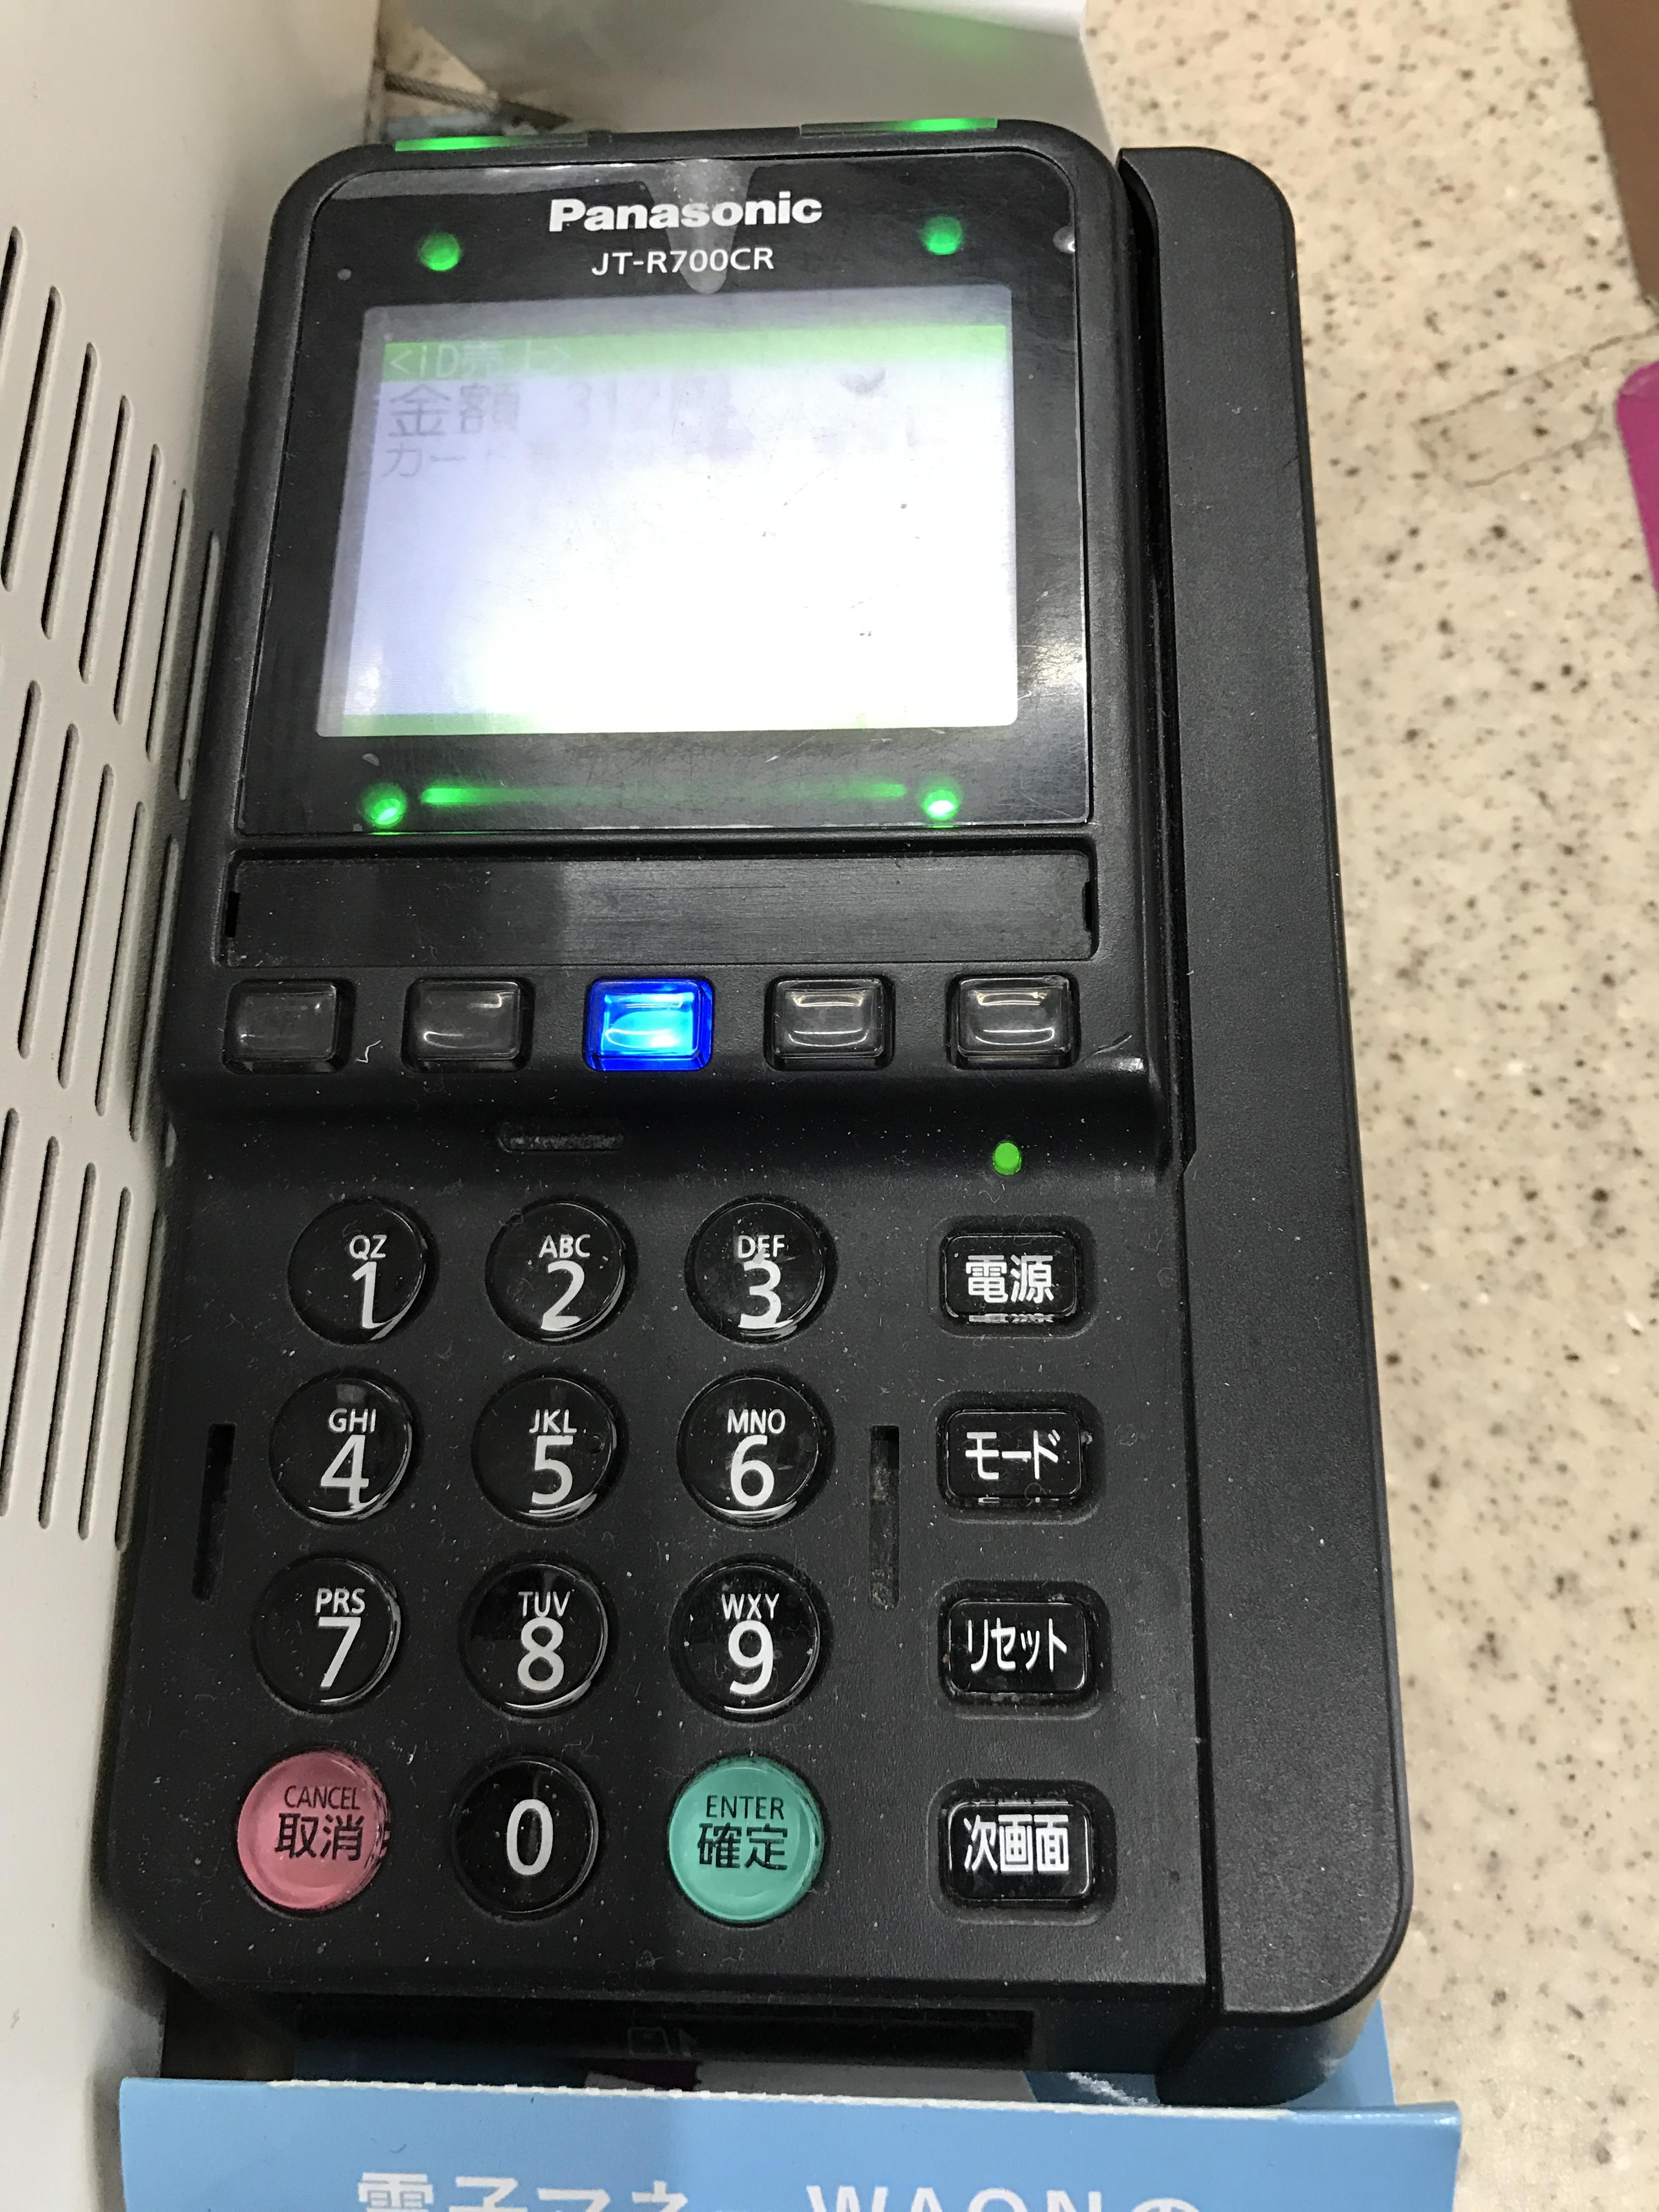 MiniStop NFC reader